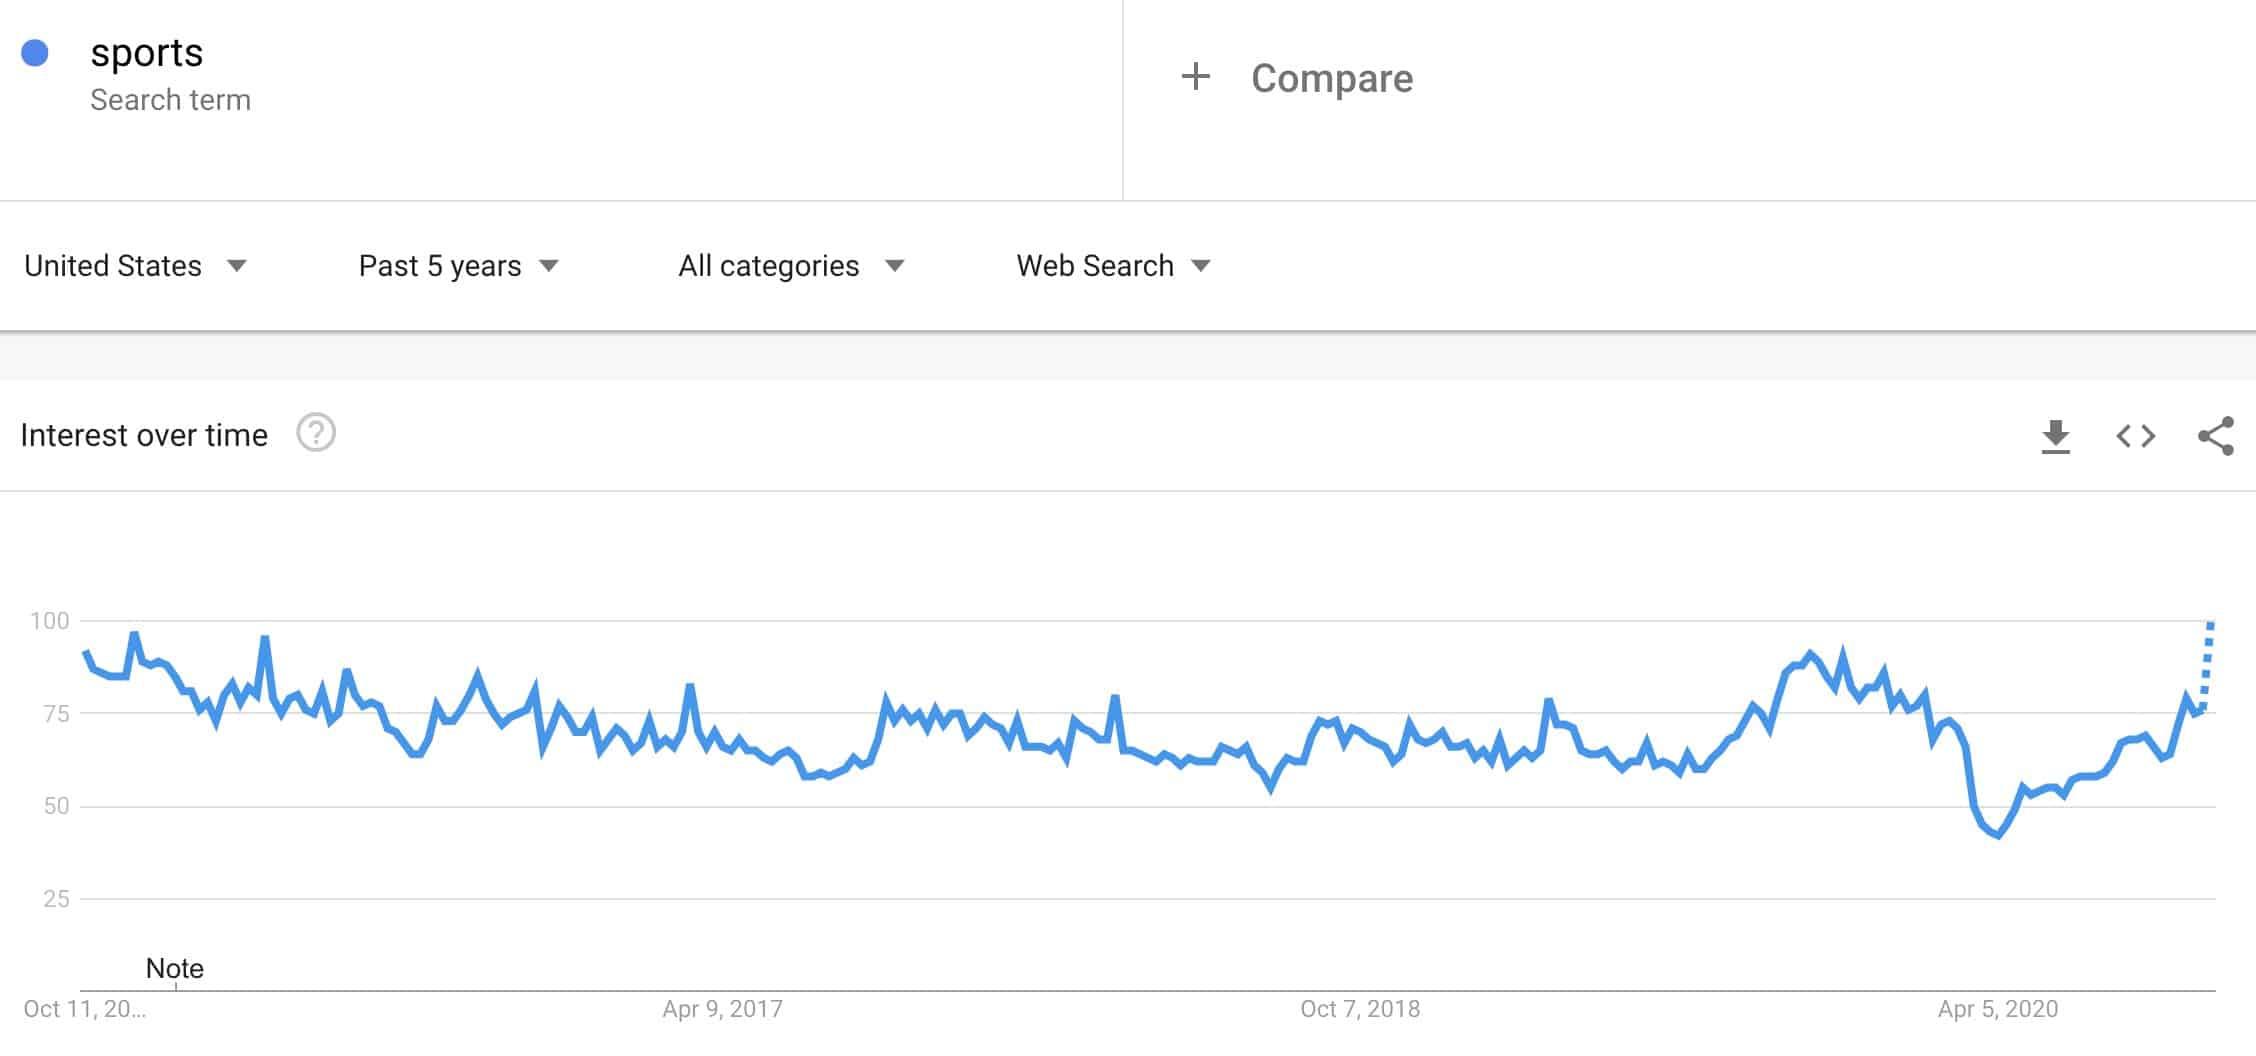 sports niche trend